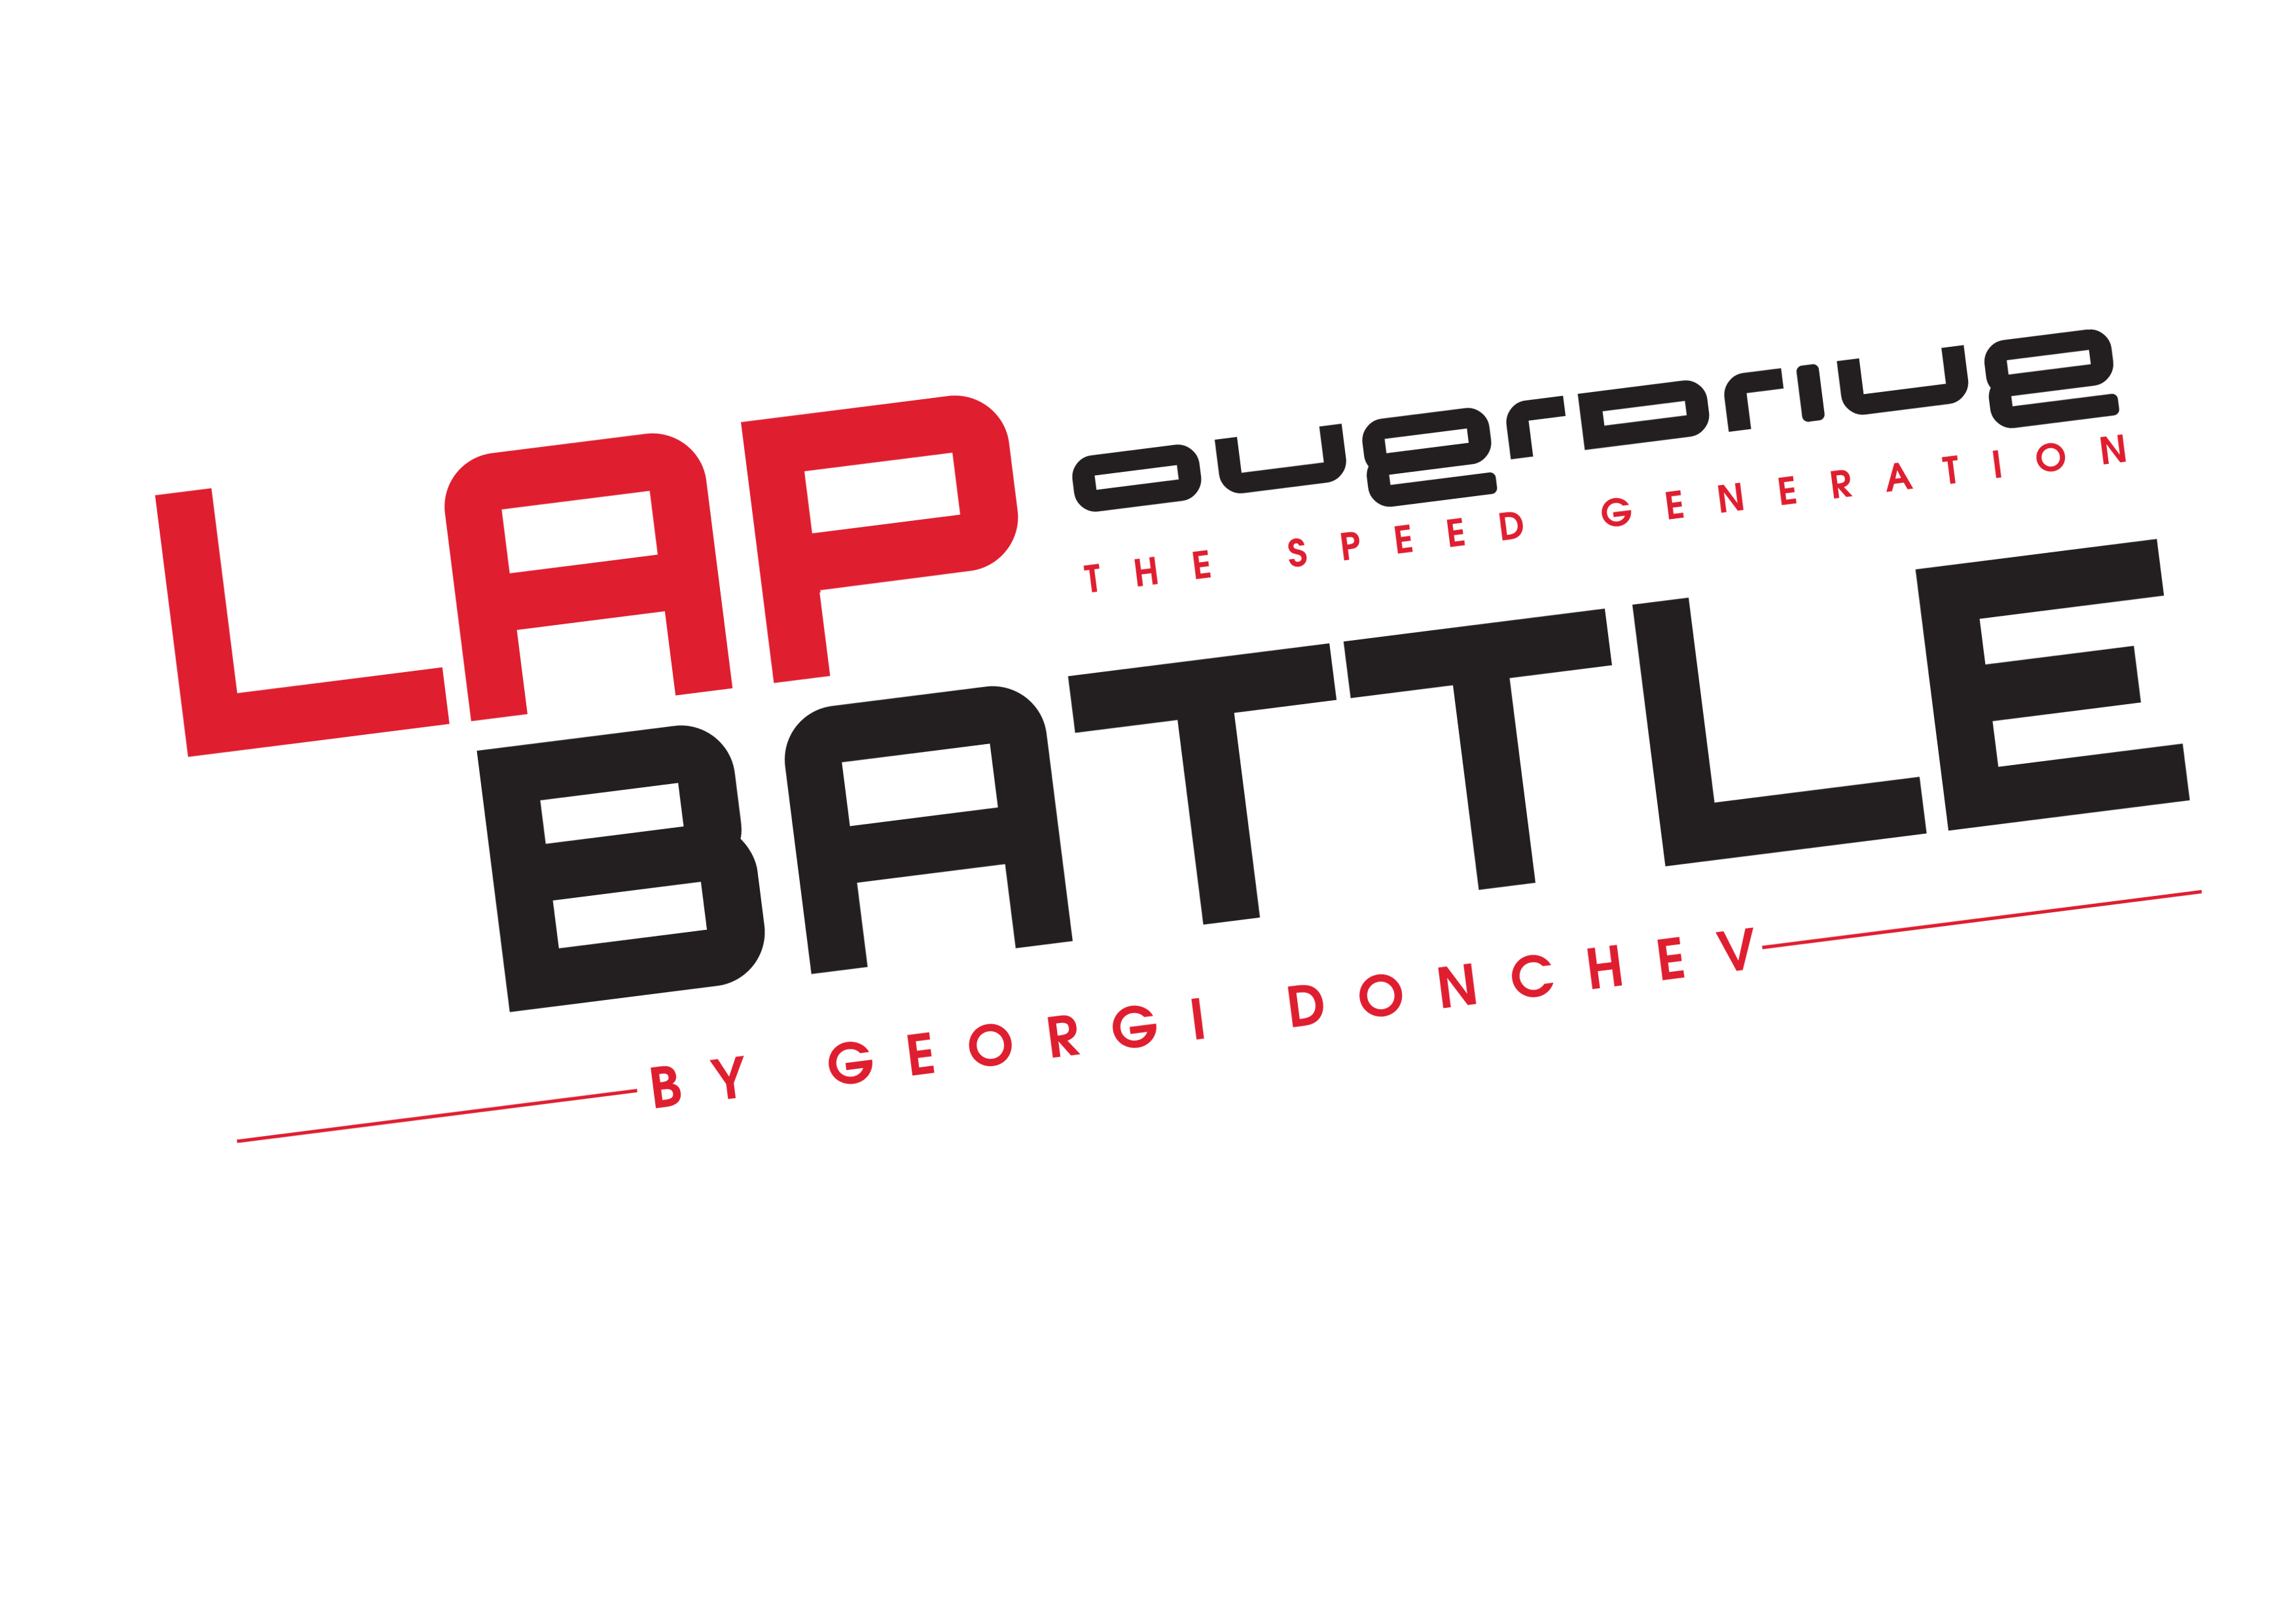 GMedia Facebook Ads Marketing Overdrive Lap Battle Client Motorsport Marketing